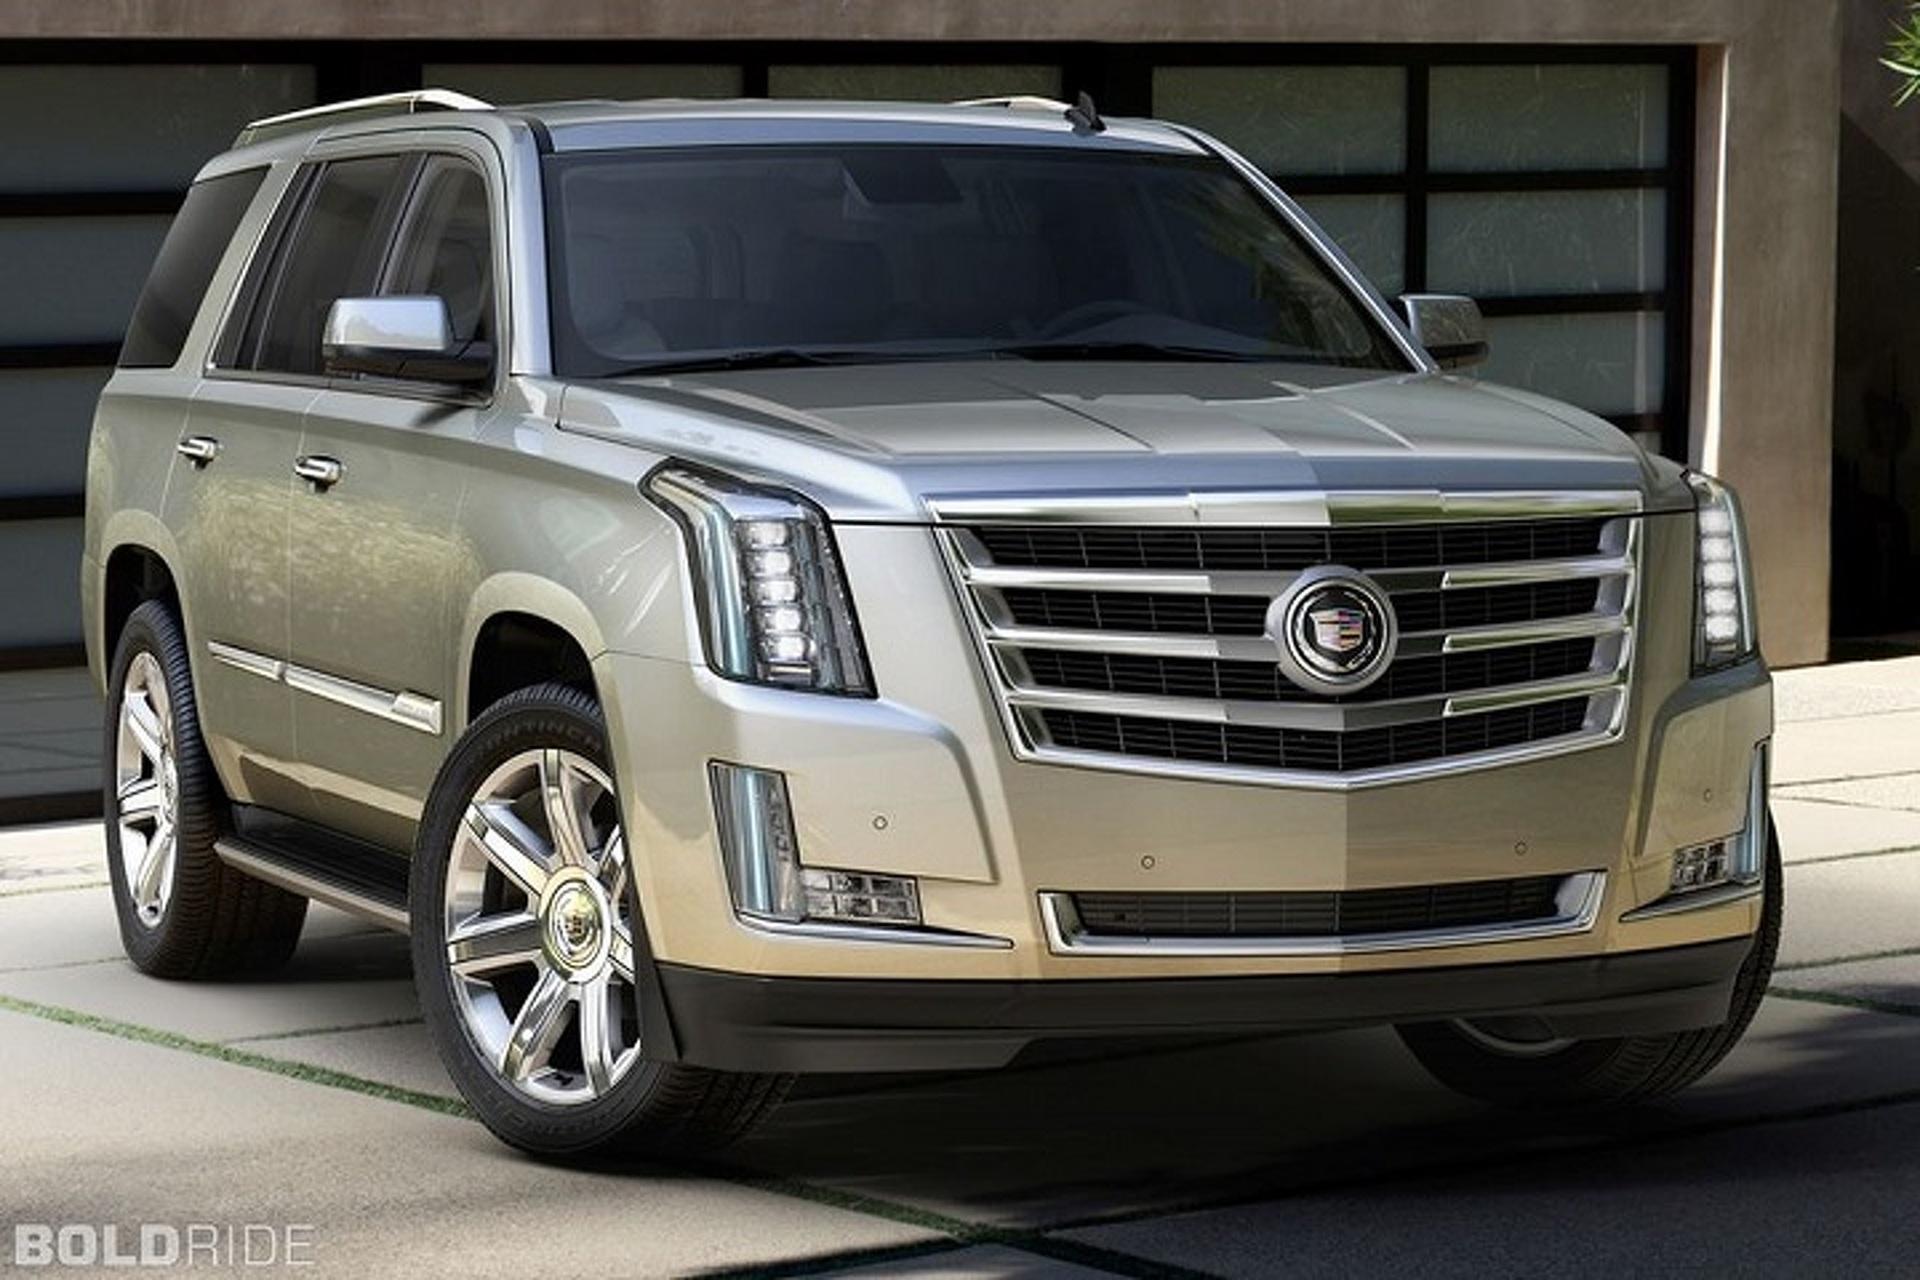 Is Cadillac Preparing a High-Performance Escalade V?